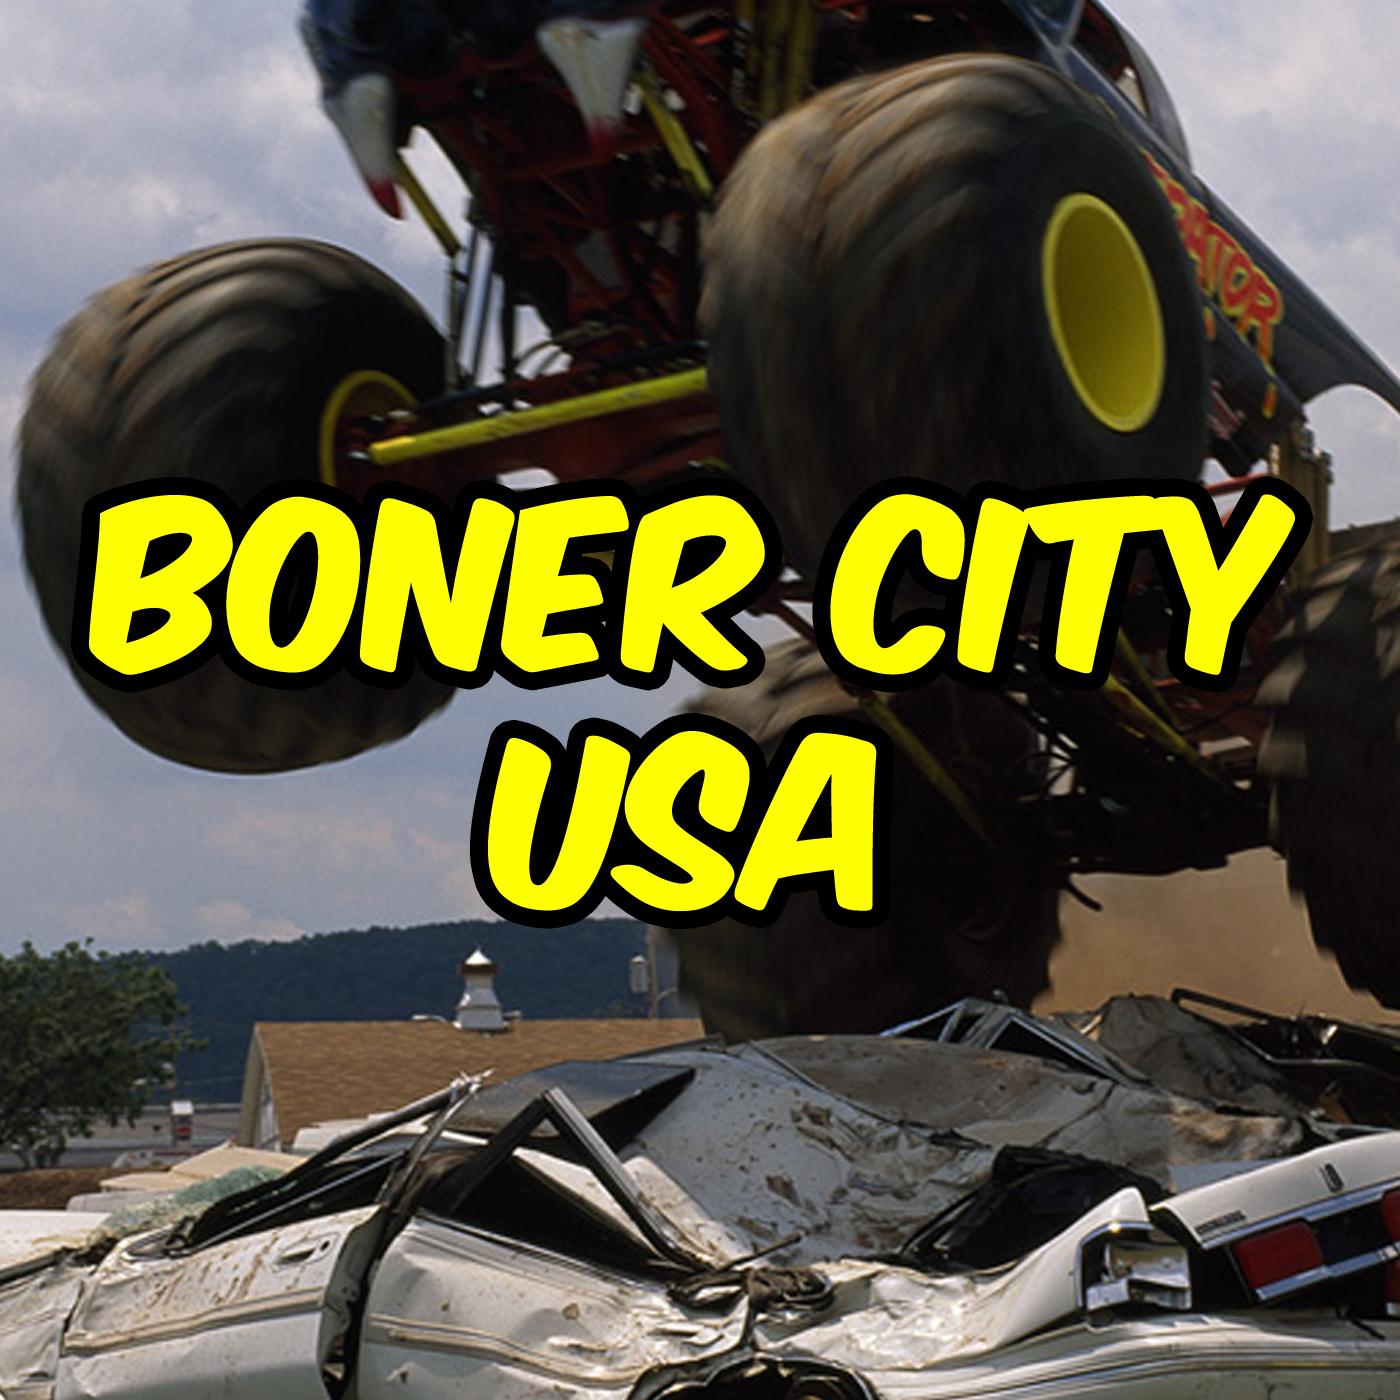 Boner City USA